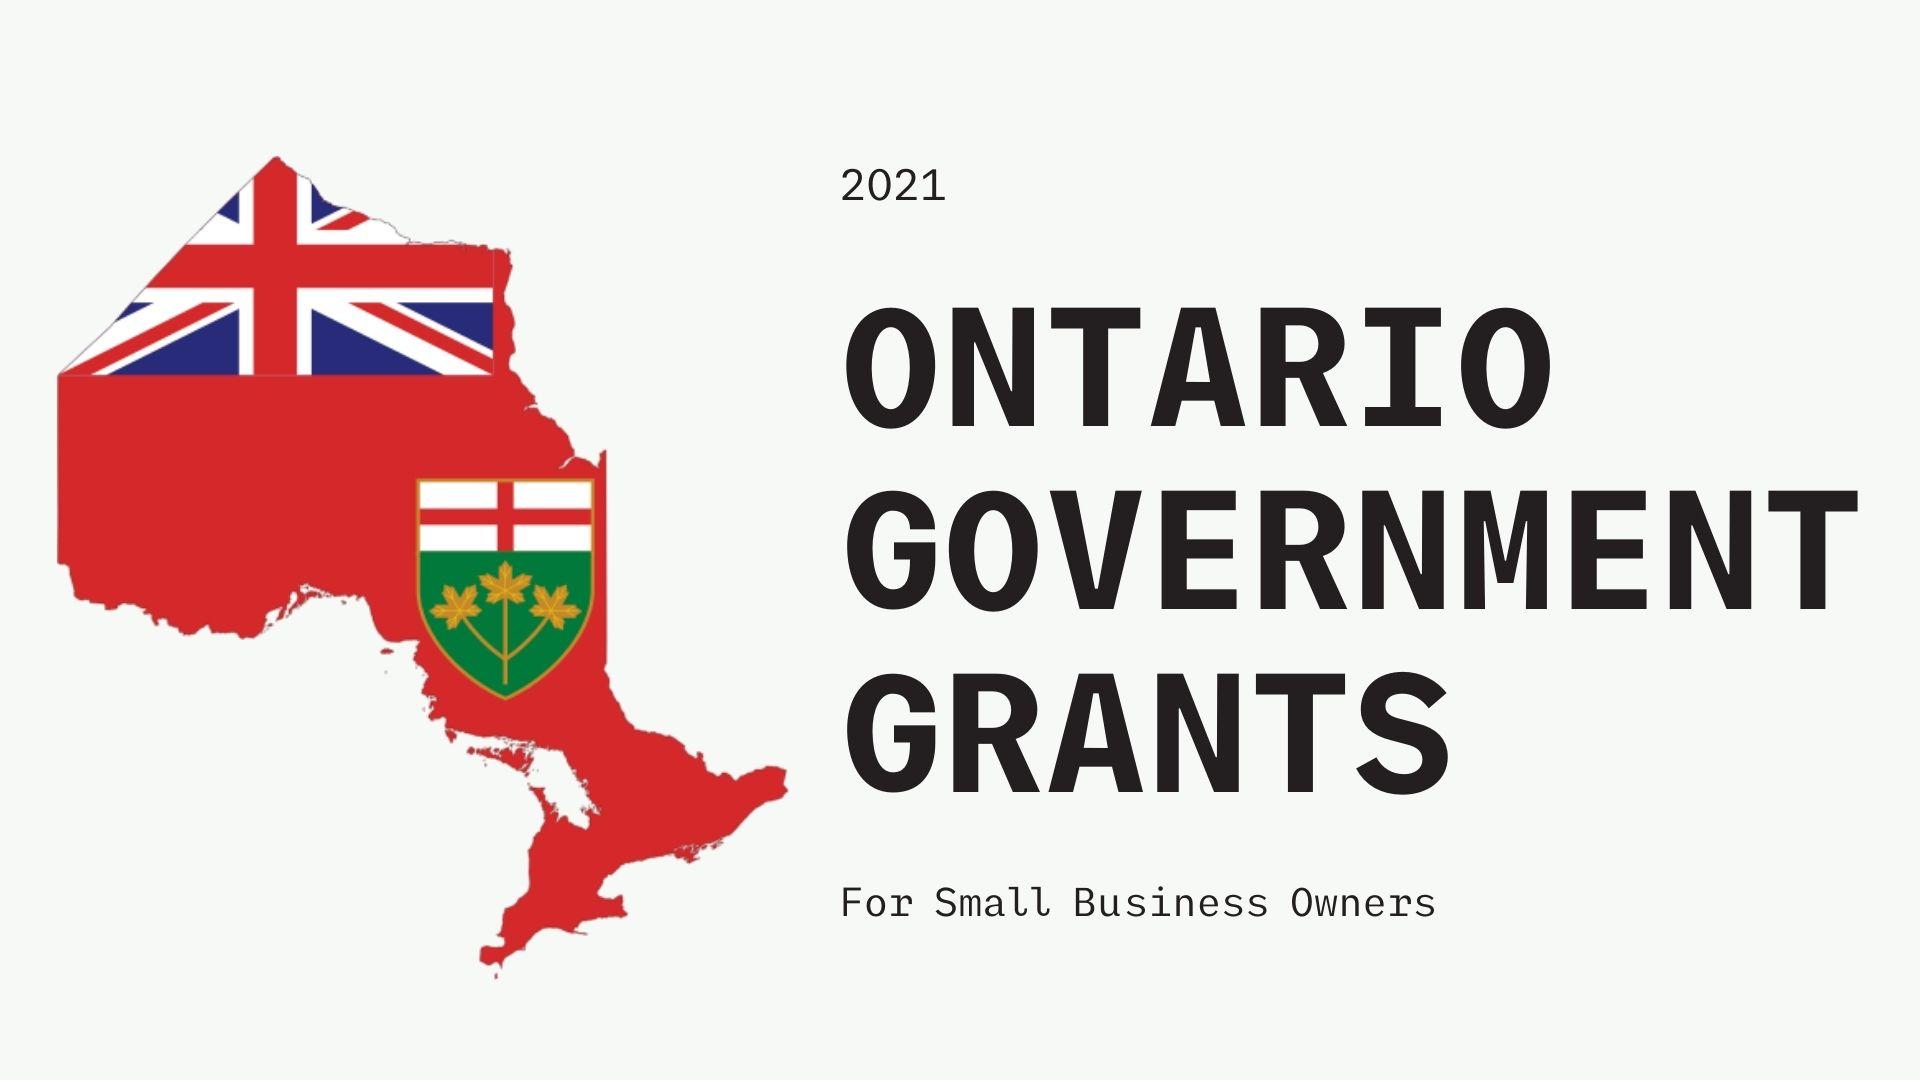 Ontario Government Grants